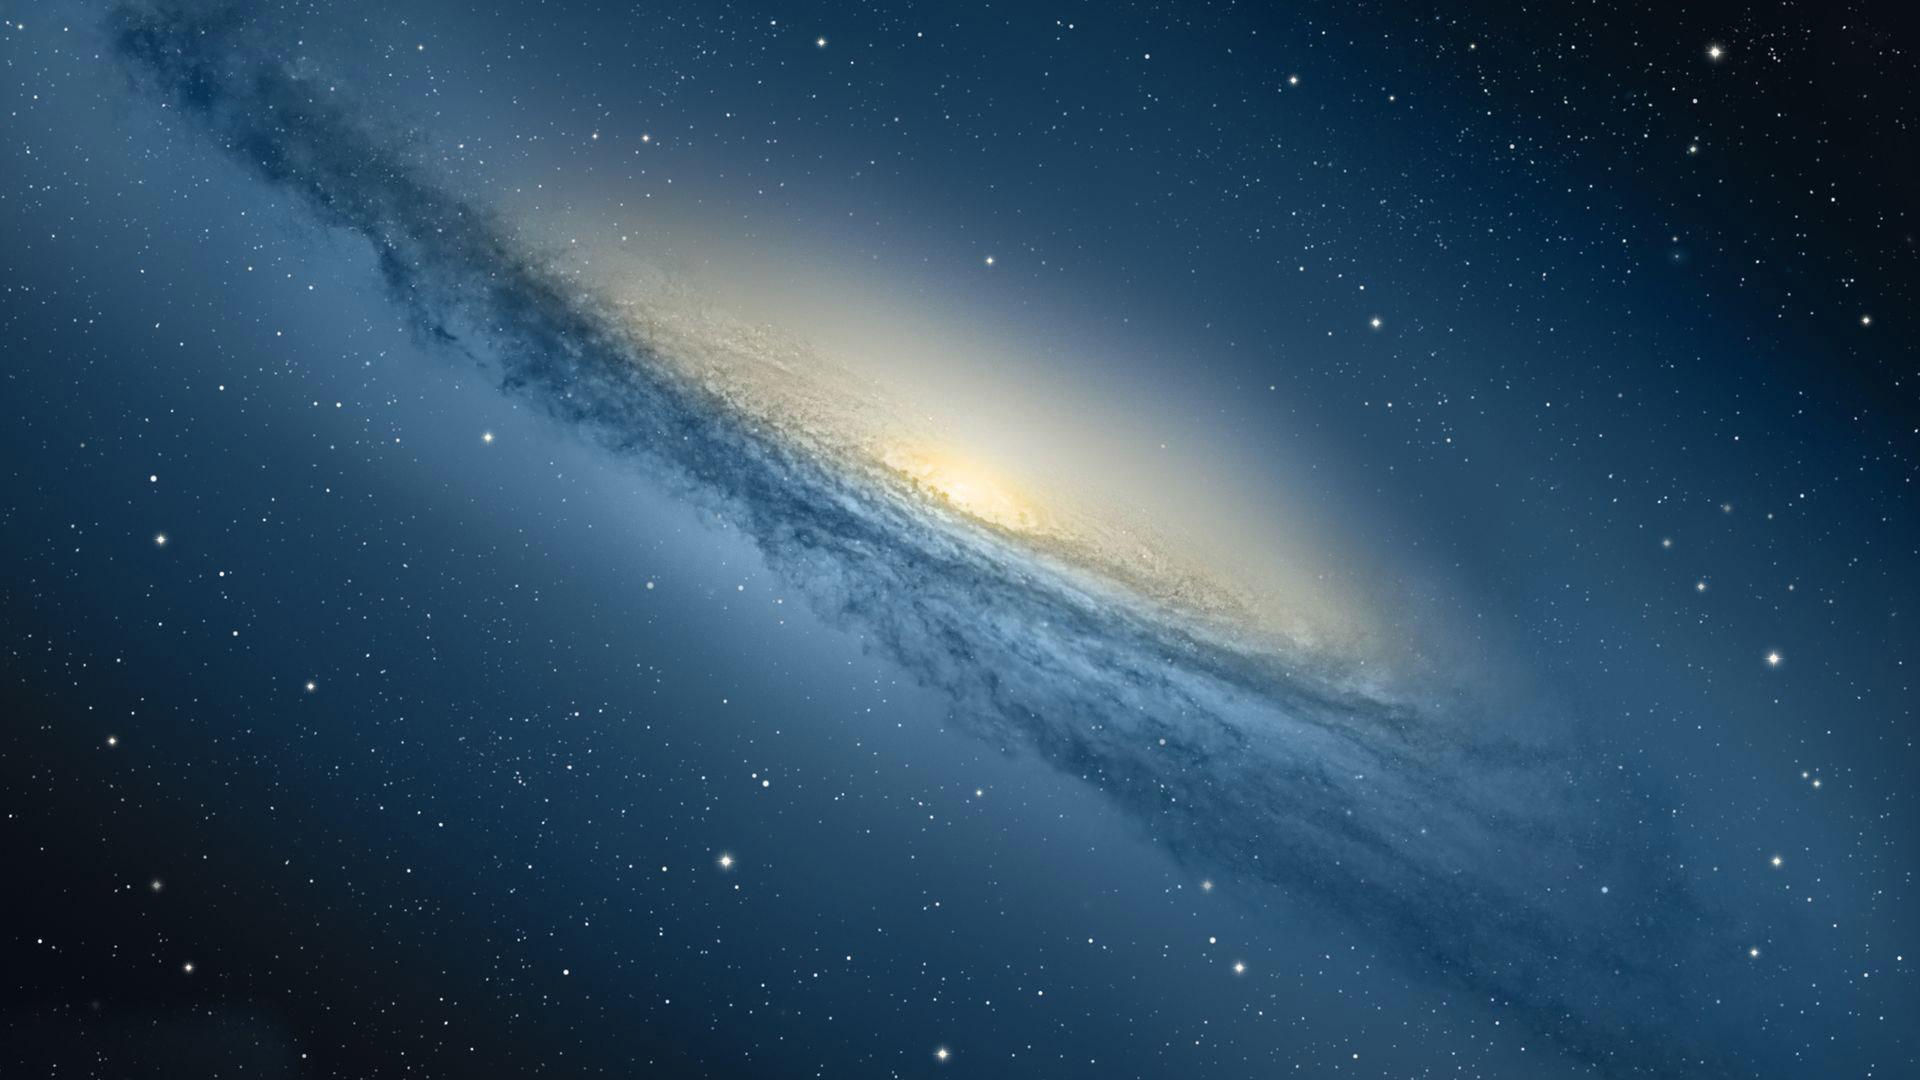 39 andromeda galaxy wallpaper hd on wallpapersafari - Spacecraft wallpaper ...